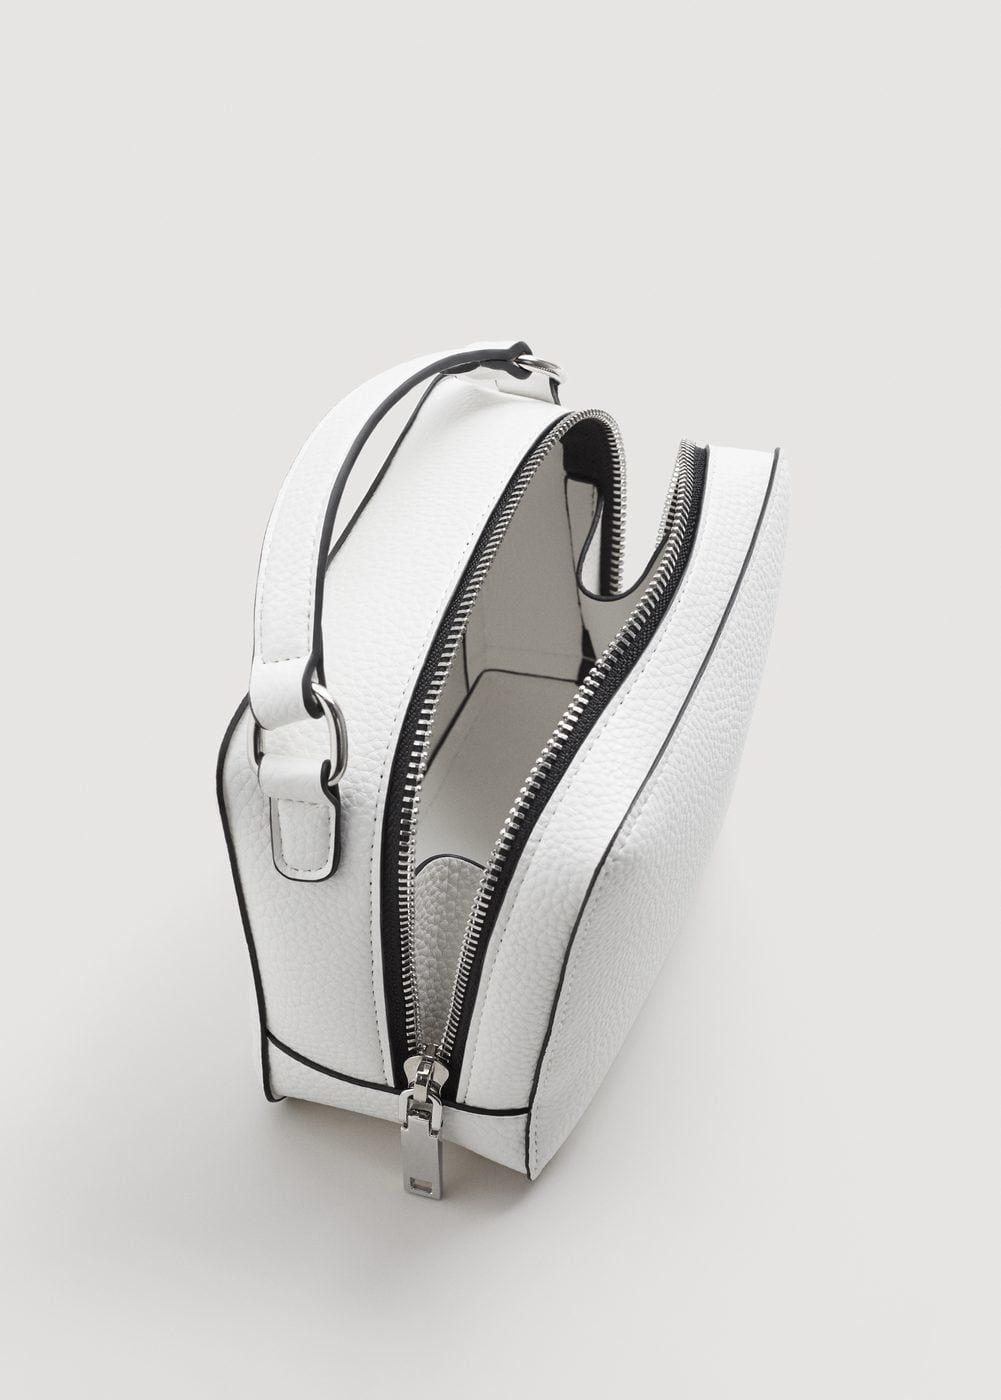 79c8f45c1588e Mini cross-body bag | MANGO Colour:White Composition:100% polyurethane #bag  #white #mango #spain #fashion #inspiration #spring #summer #accessories  #style # ...